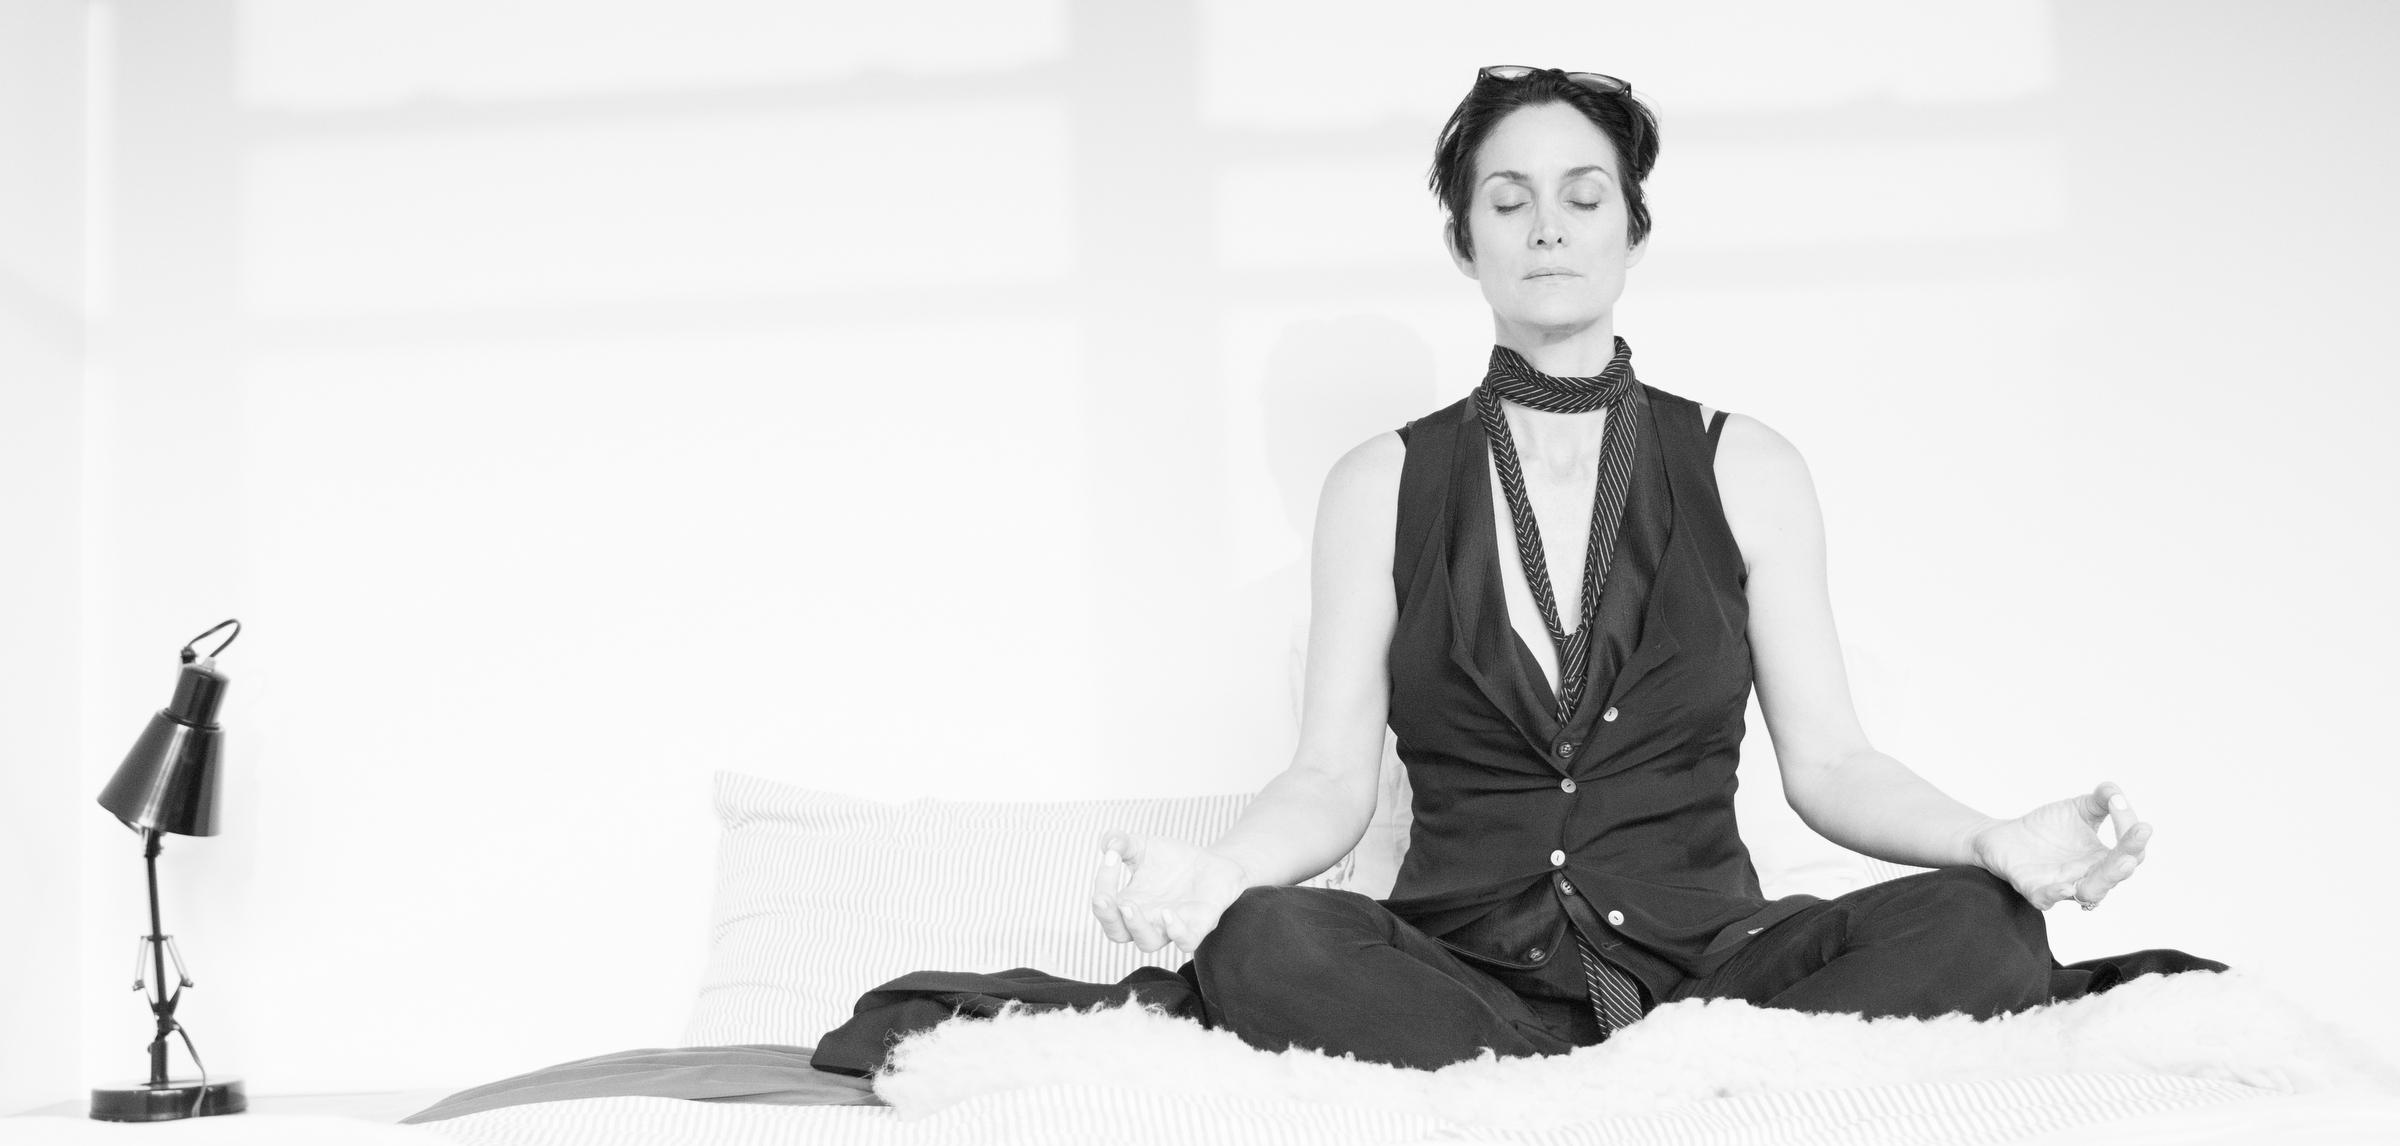 Carrie-Anne Moss Meditation